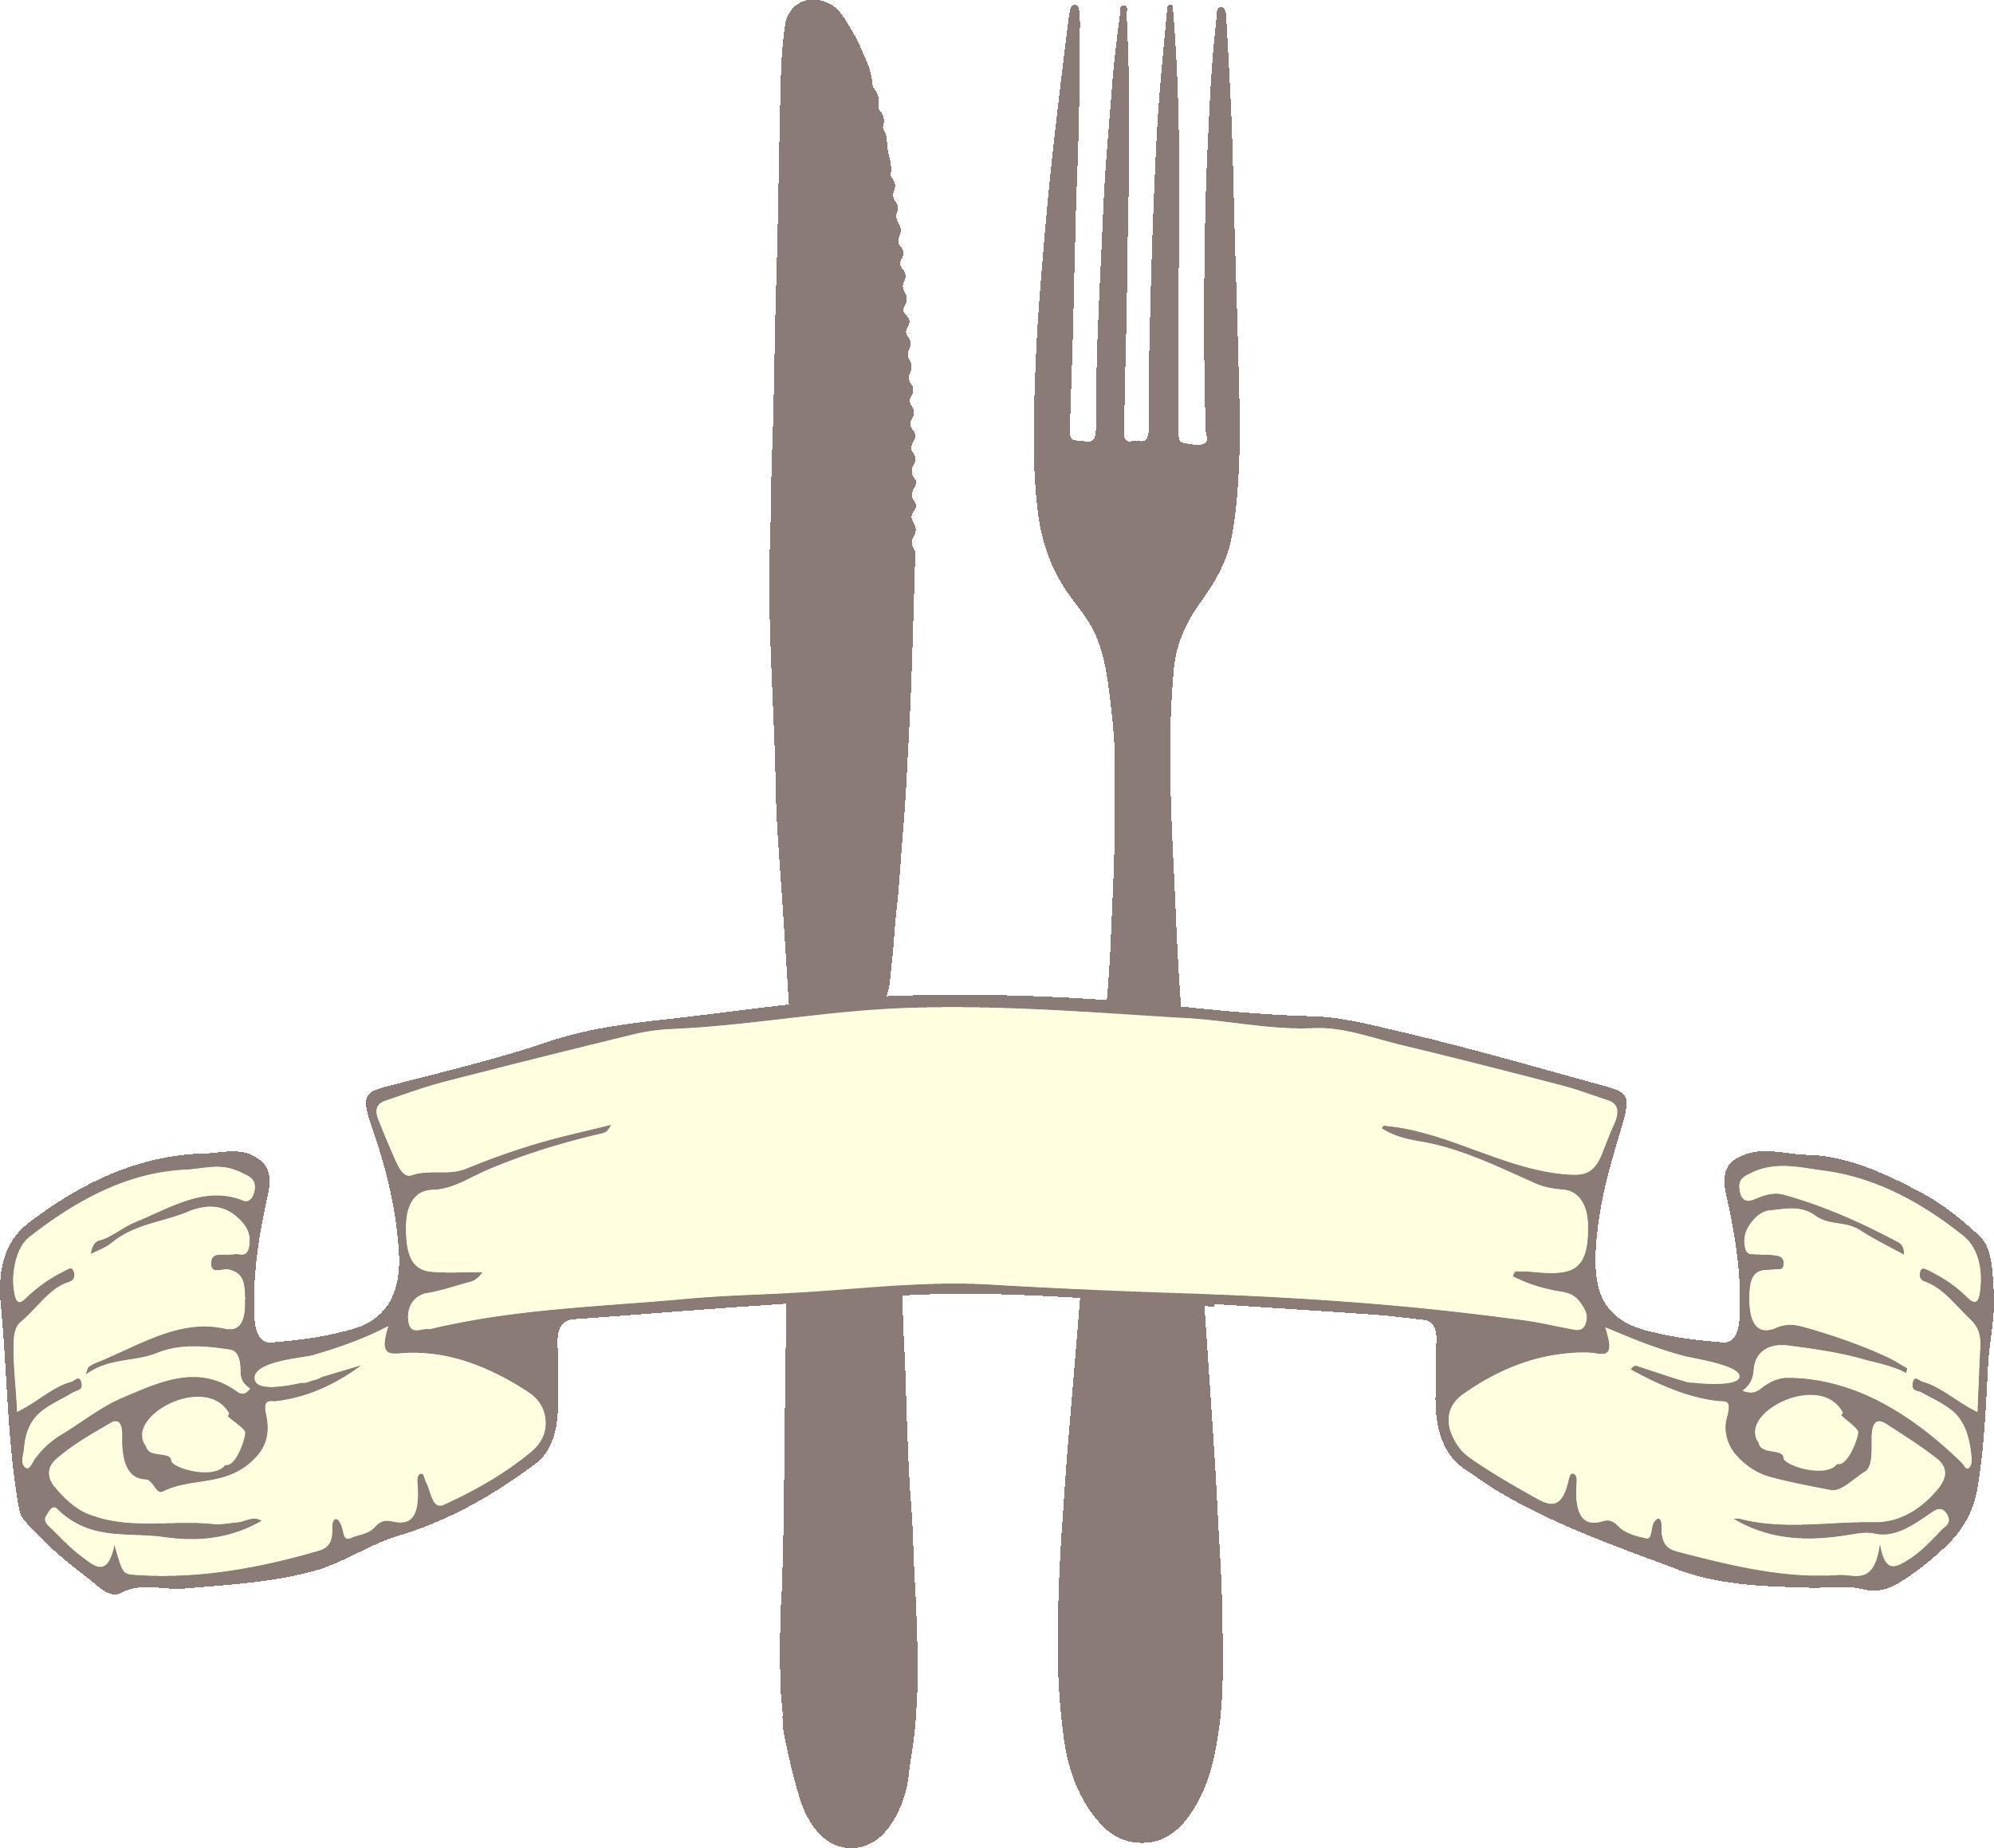 Knife european cuisine yellow. Clipart restaurant spoon fork